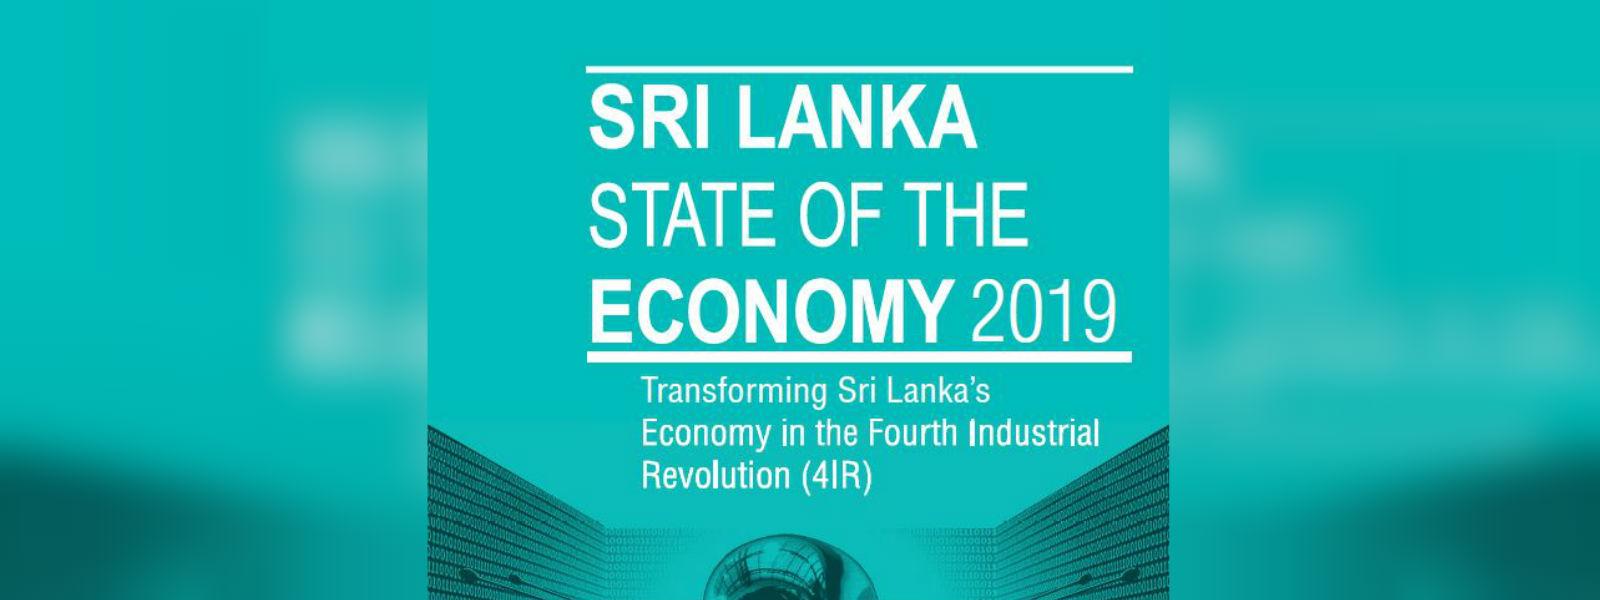 4ir and the future of work in Sri Lanka